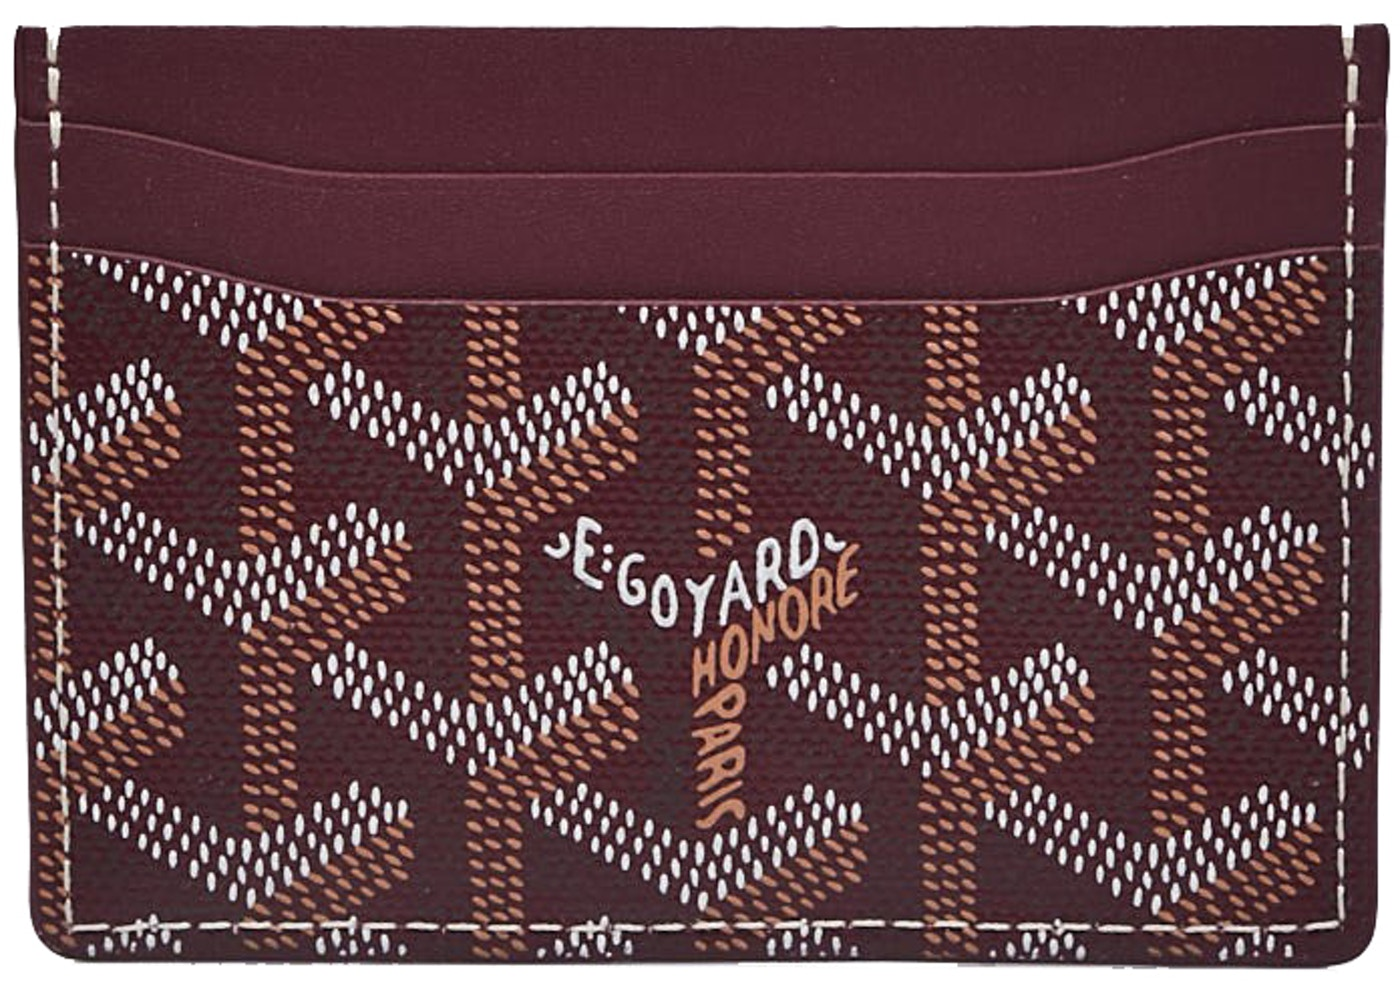 ee6ab02e33c Buy   Sell Goyard Luxury Handbags